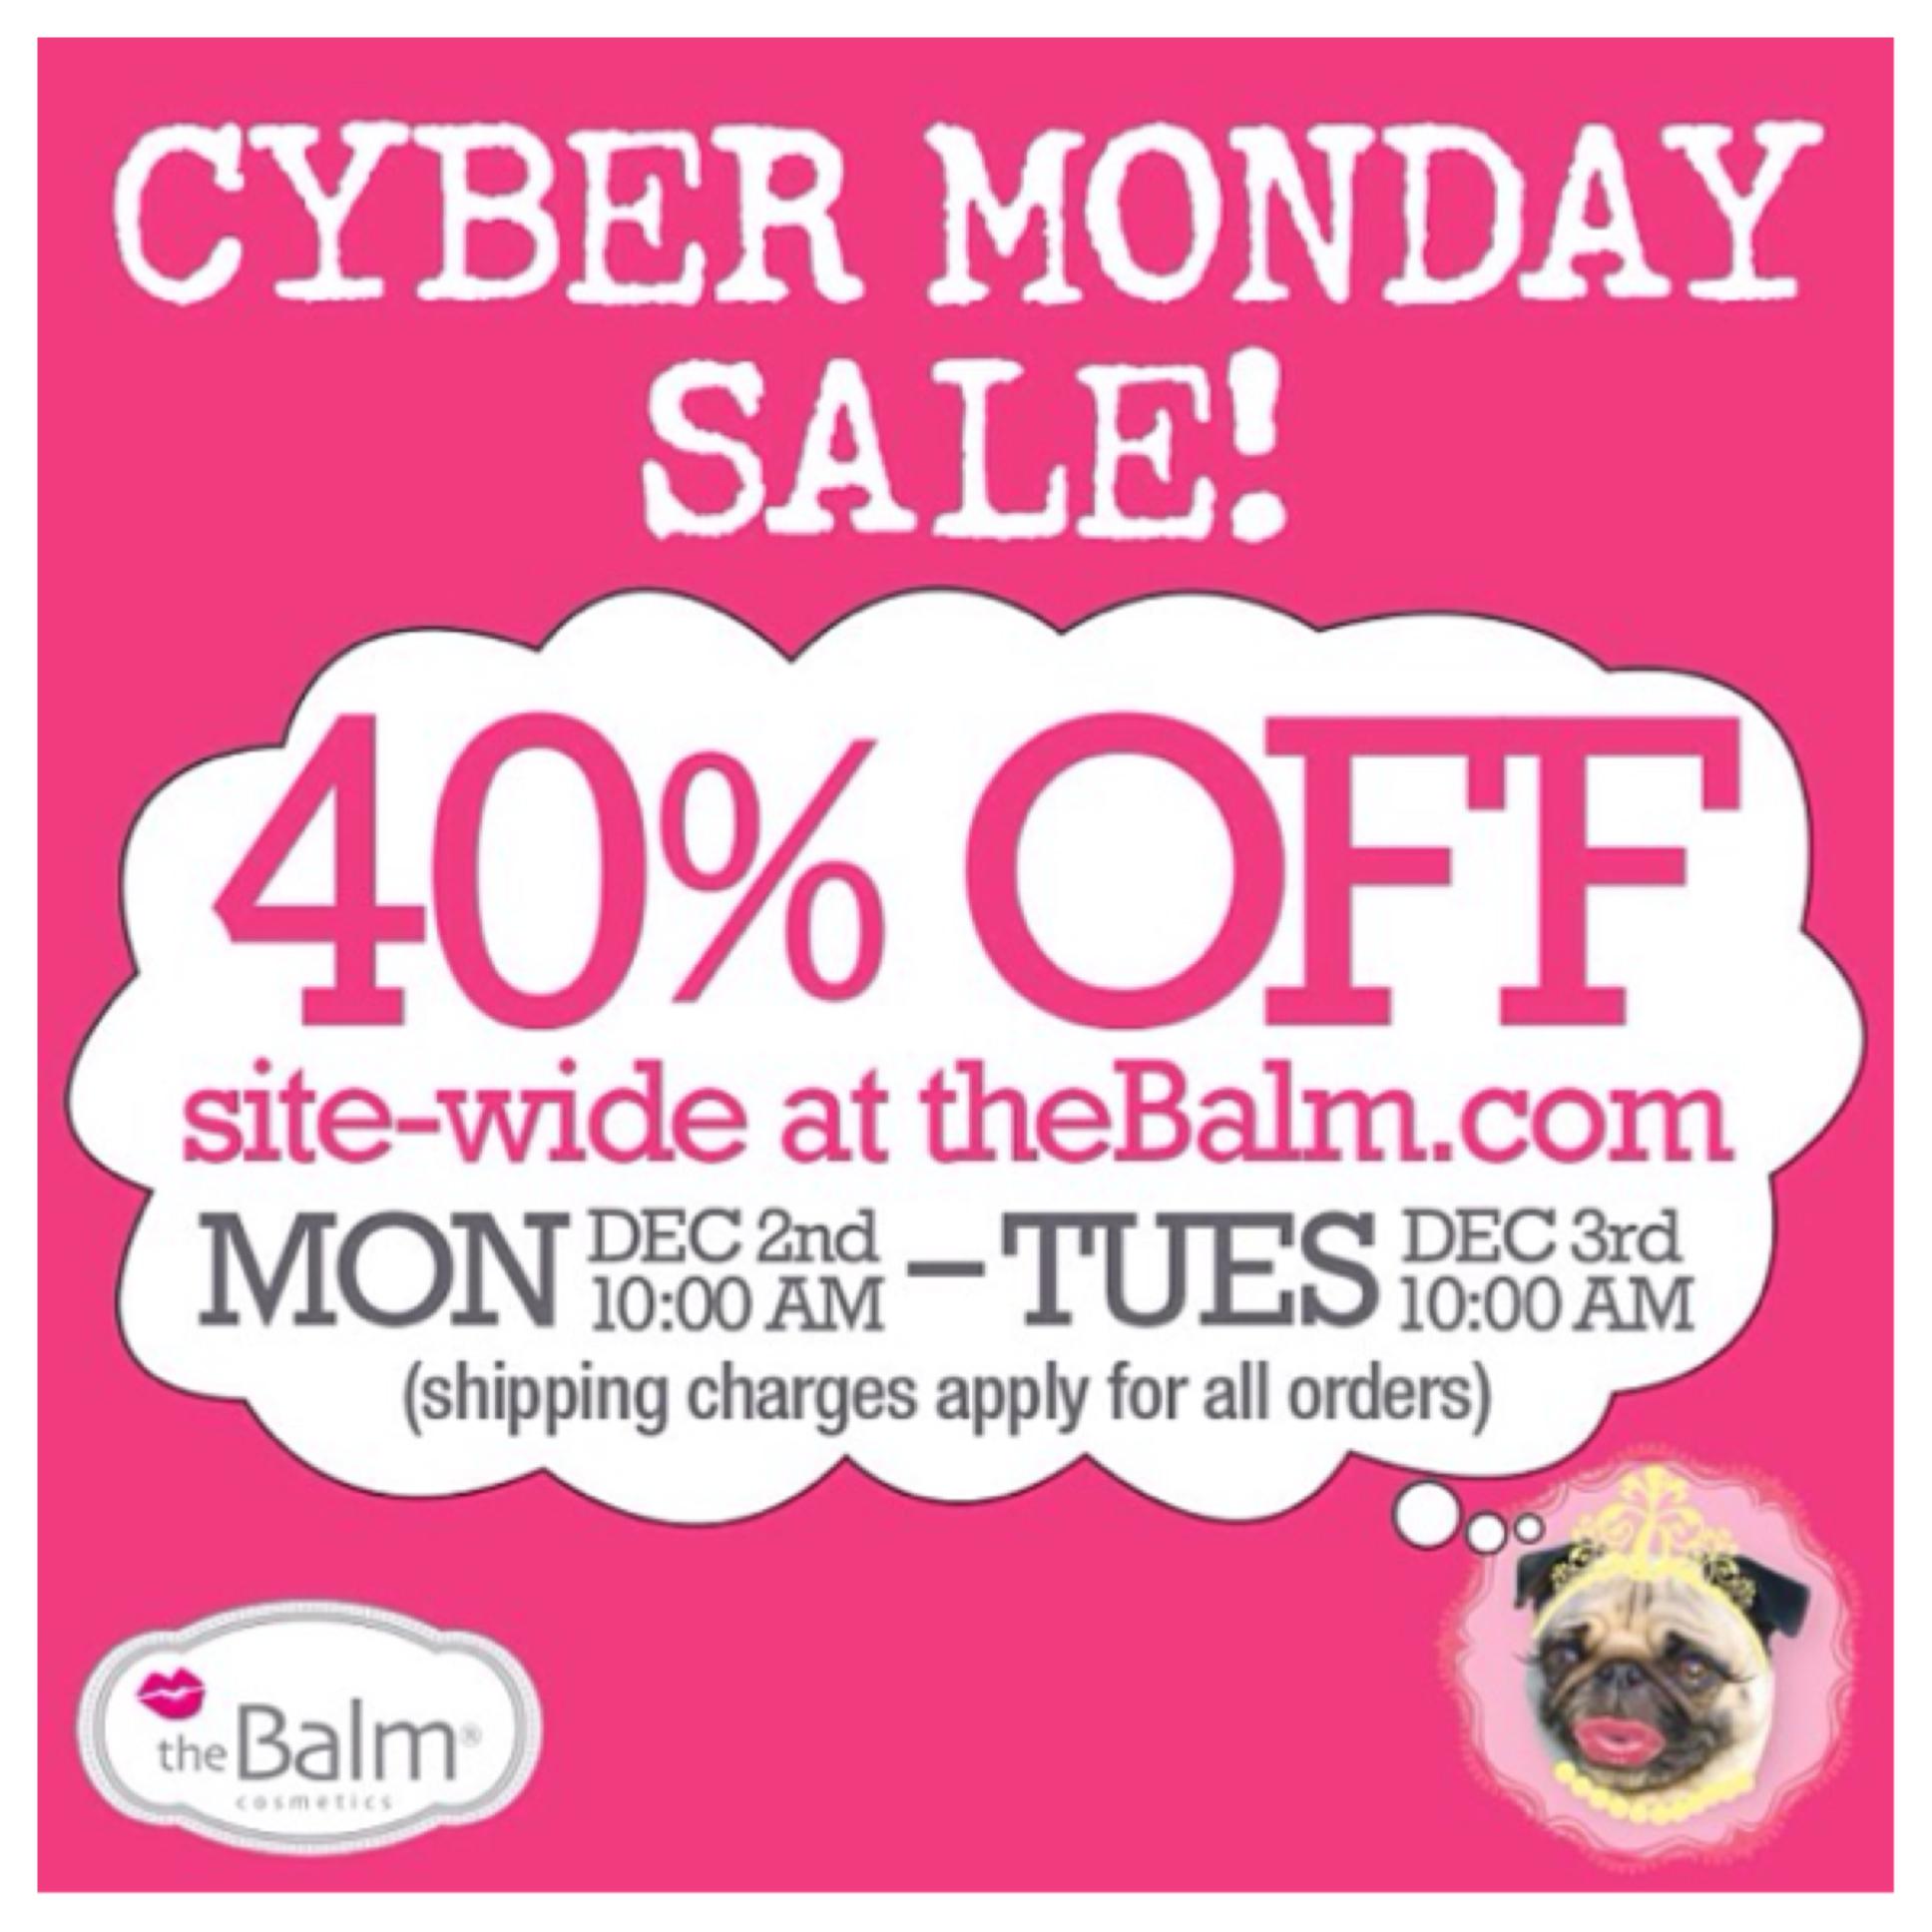 The Balm Cyber Monday